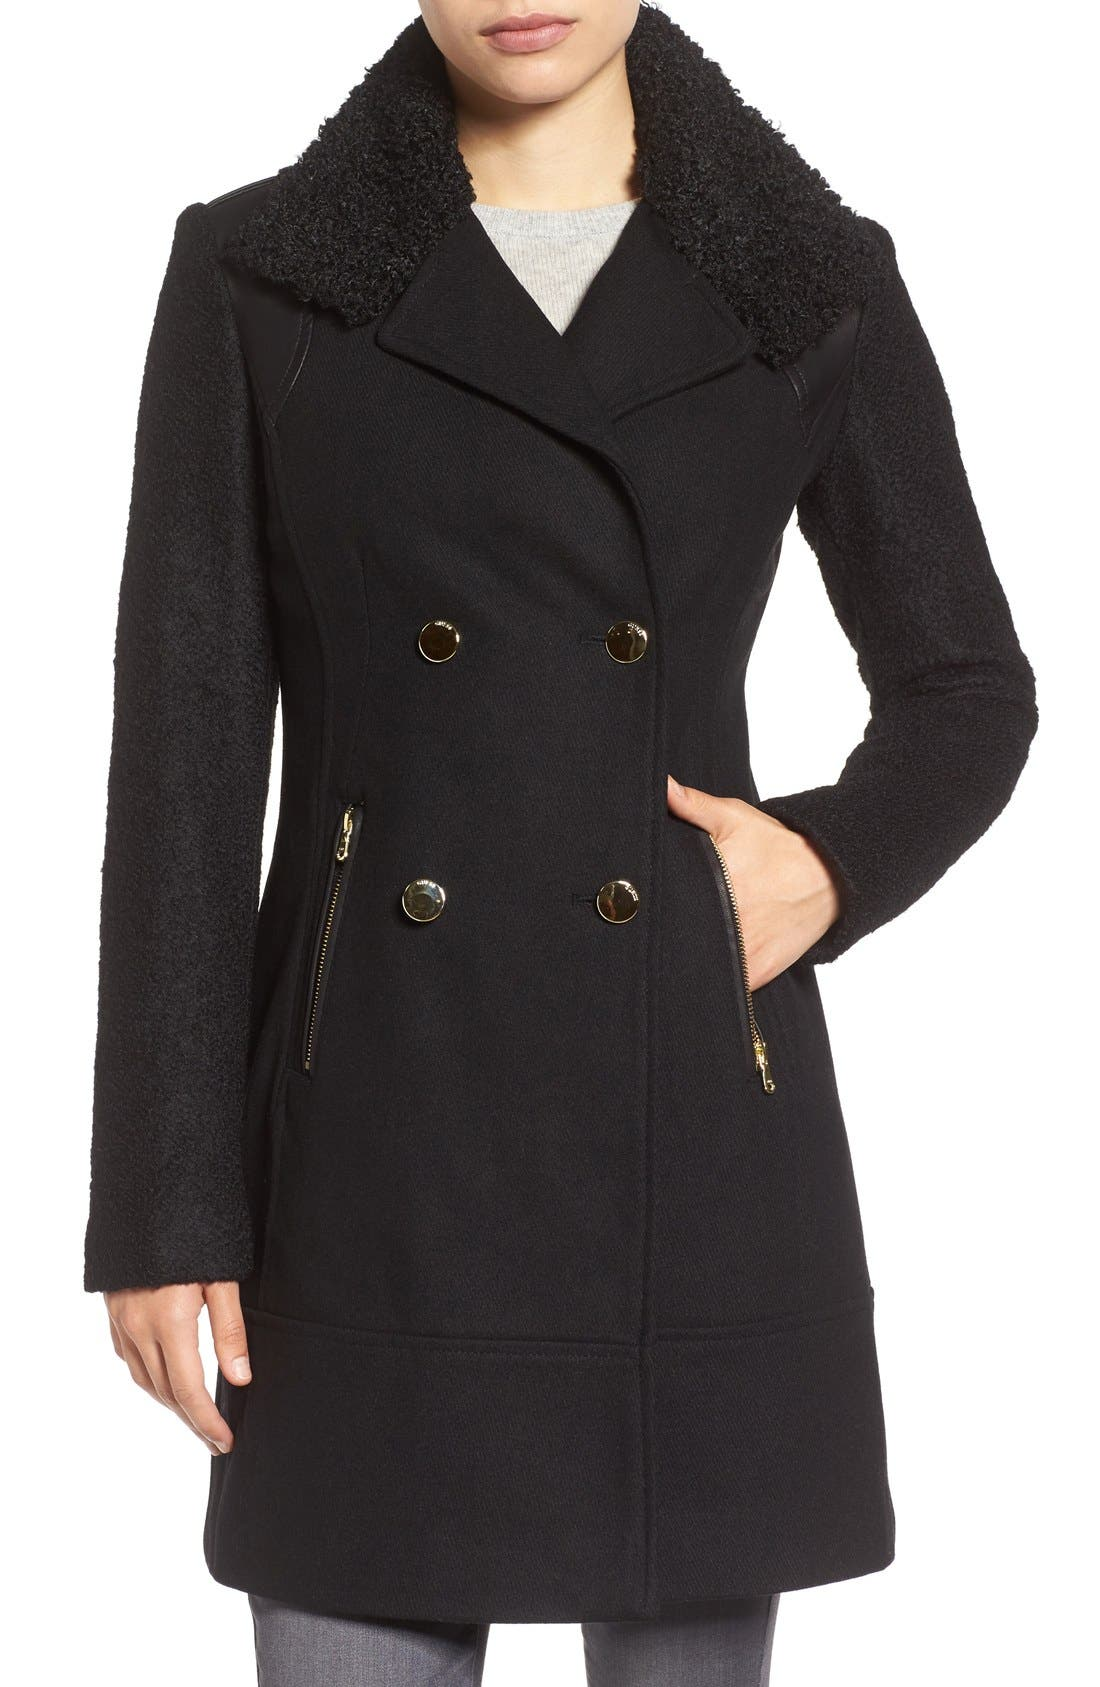 Bouclé Sleeve Wool Blend Military Coat,                         Main,                         color, Black